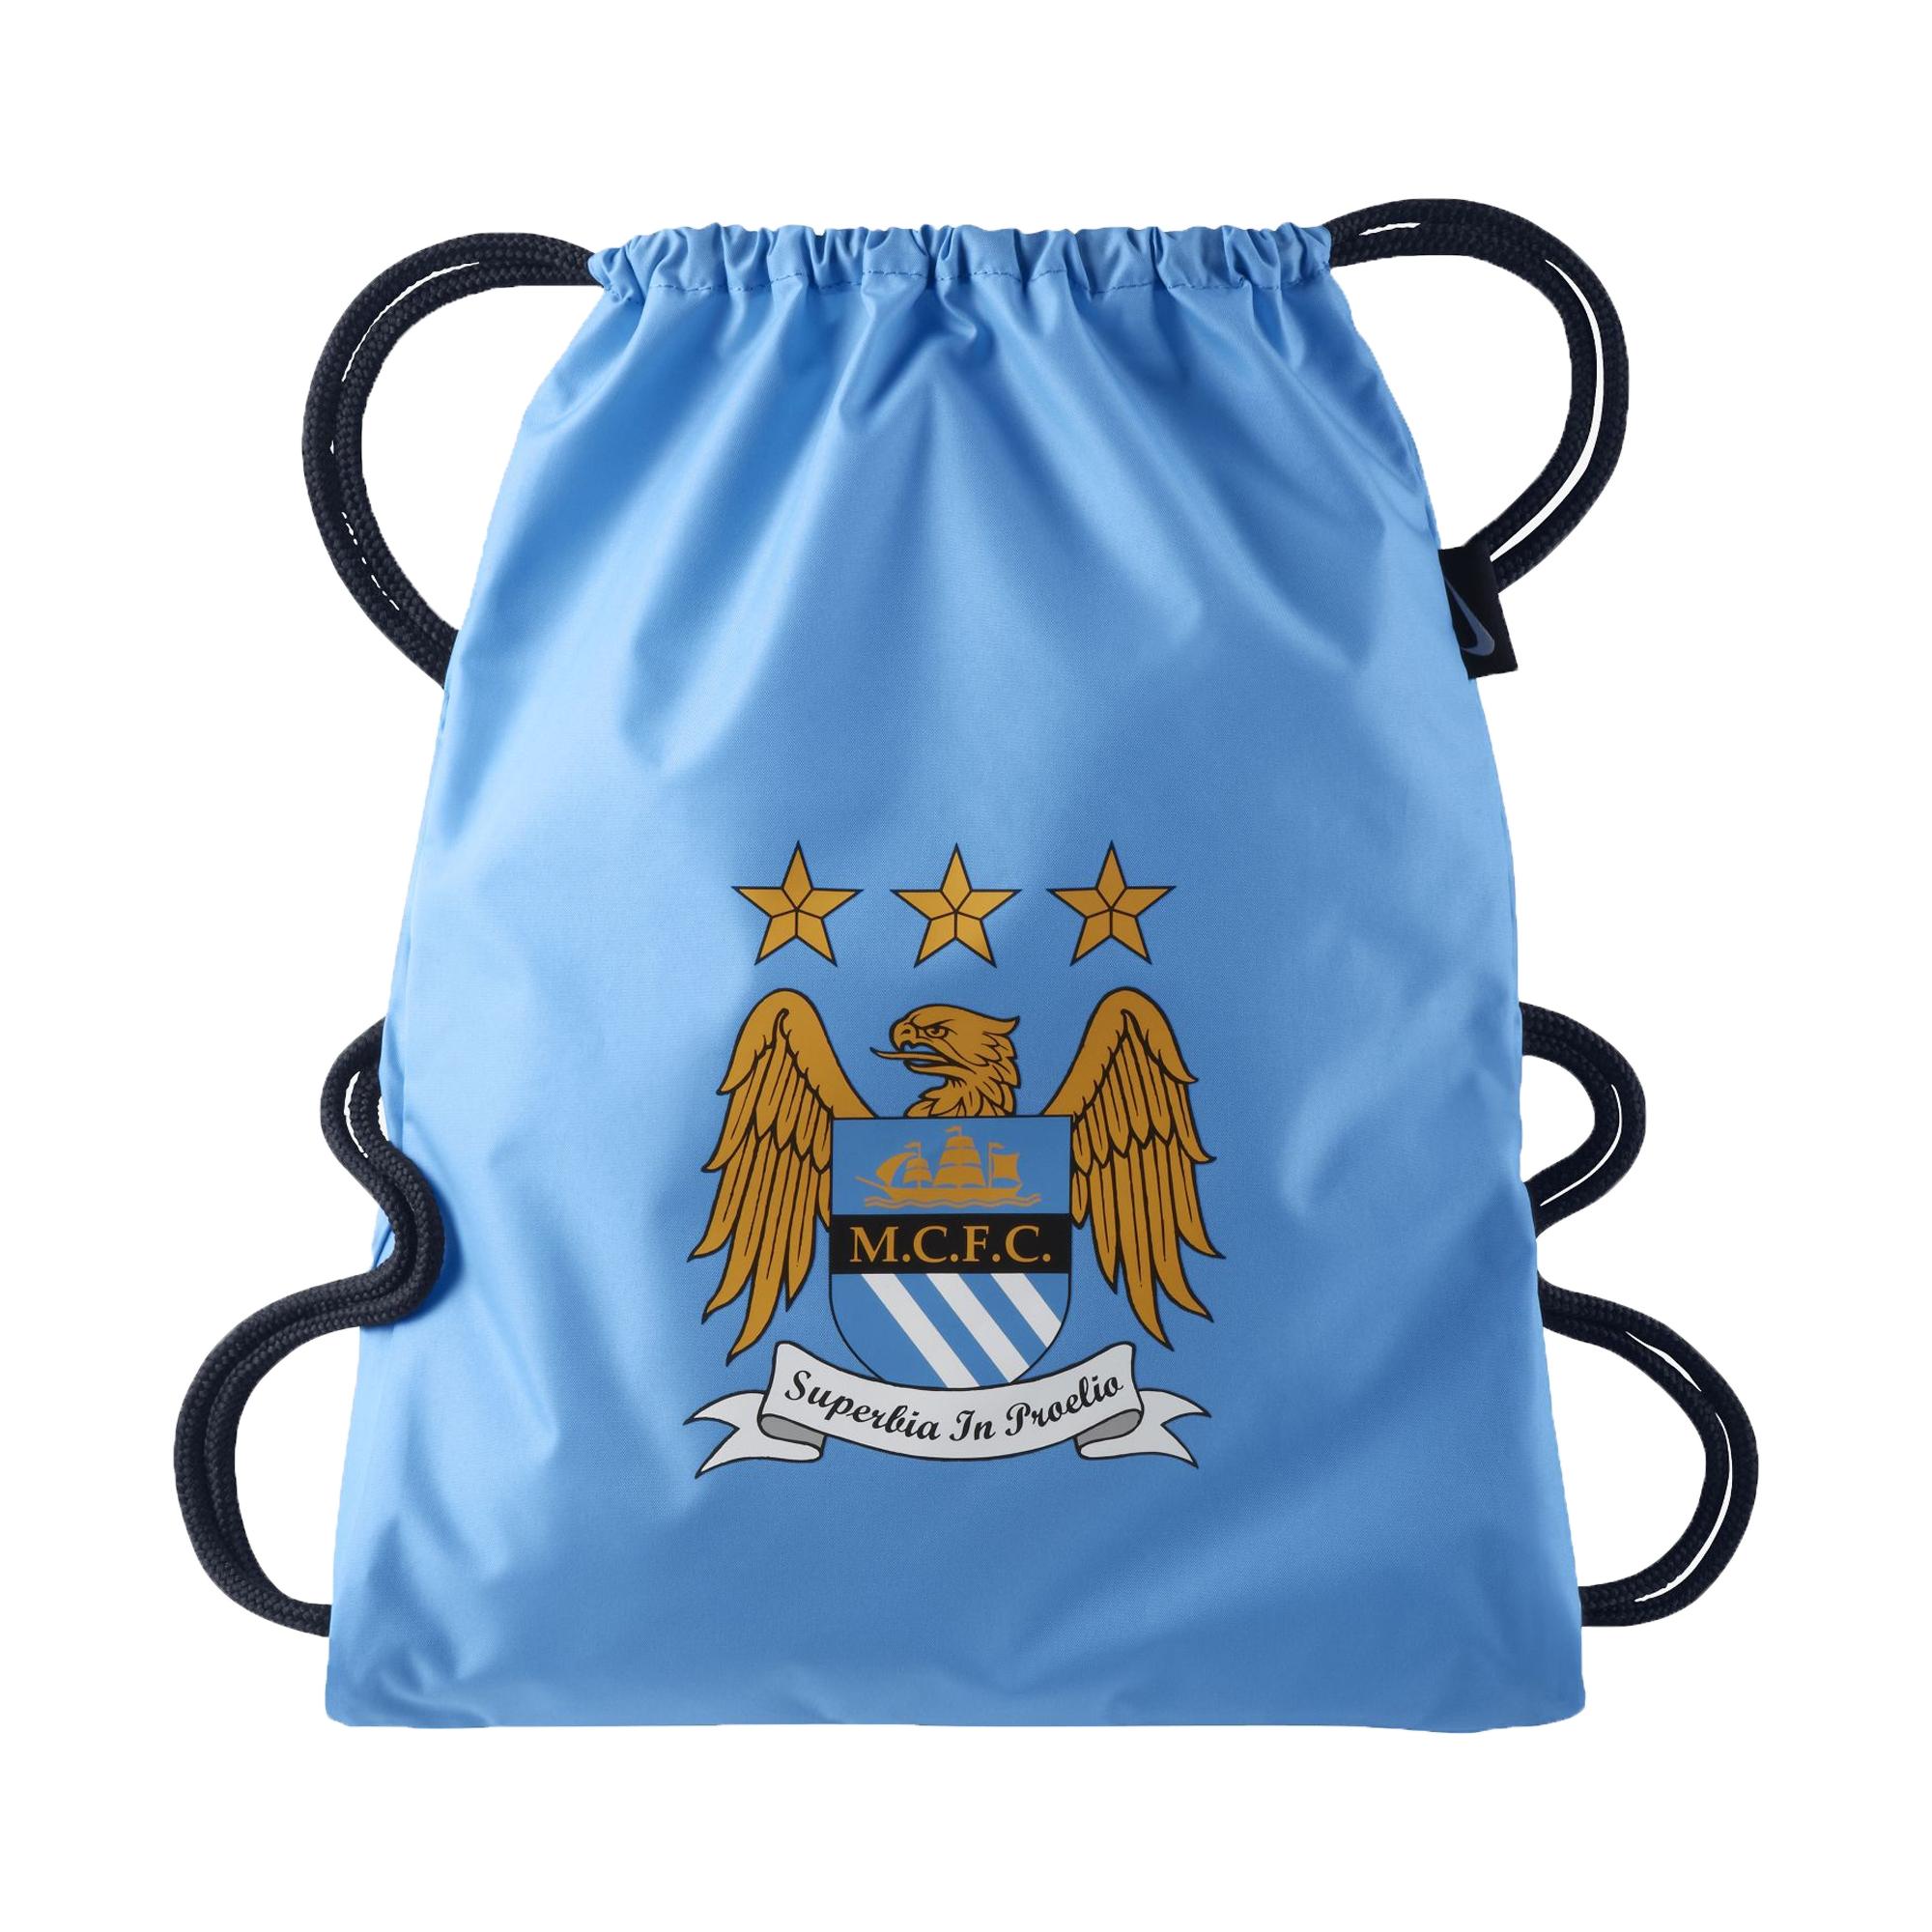 9cc4c861f1 Nike Allegiance Manchester City Gymsack 2 Çanta